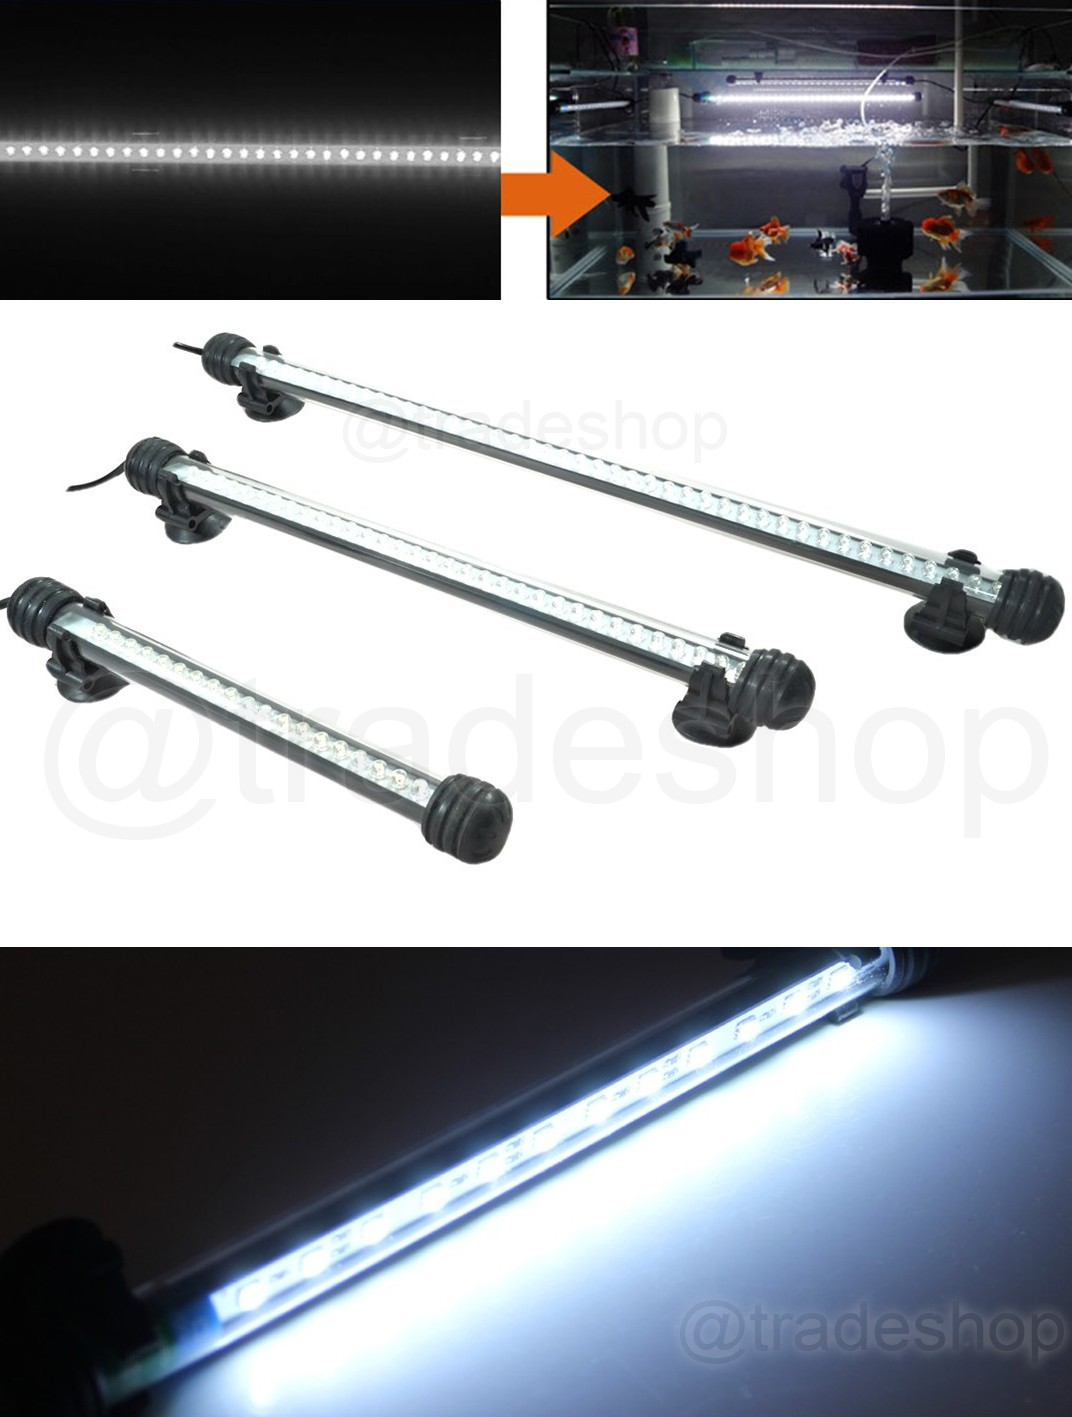 LAMPADA-IMMERSIONE-LED-PER-ACQUARIO-TUBO-LED-T4-DEE-LUCE-PESCI-BIANCA-RGB-BLU miniatura 5